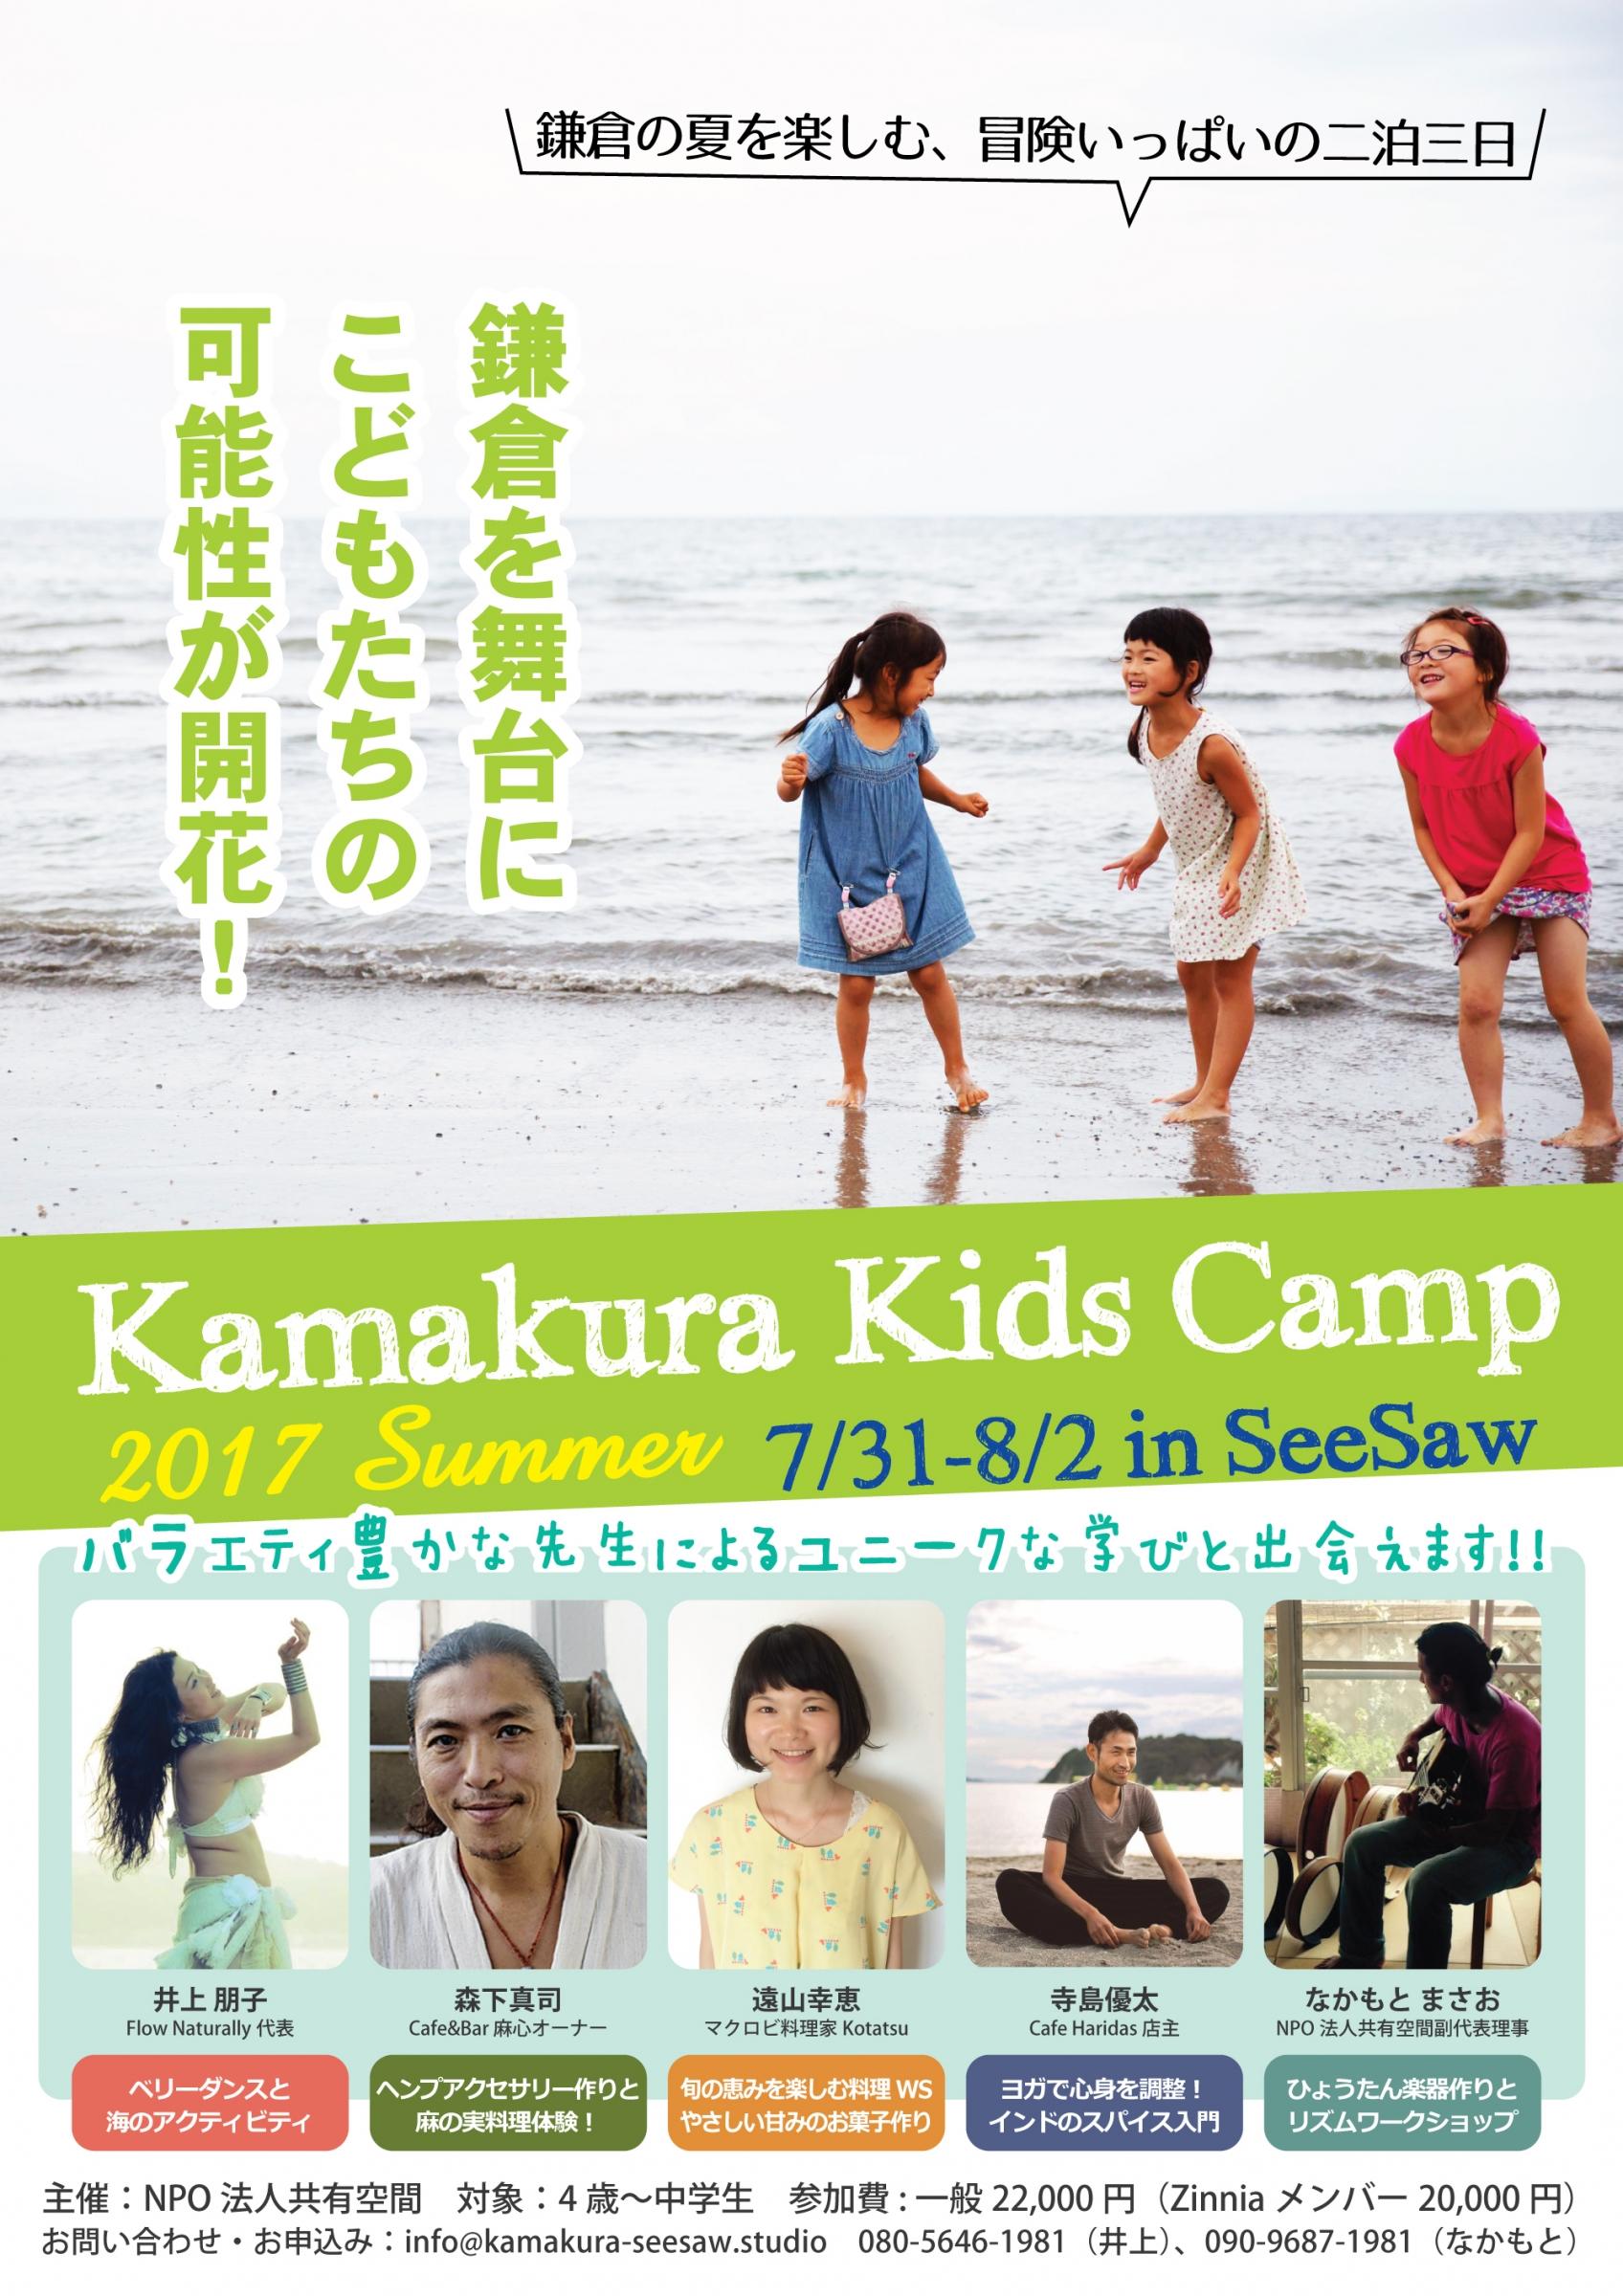 KKC_2017summer_panphlet_01.jpg